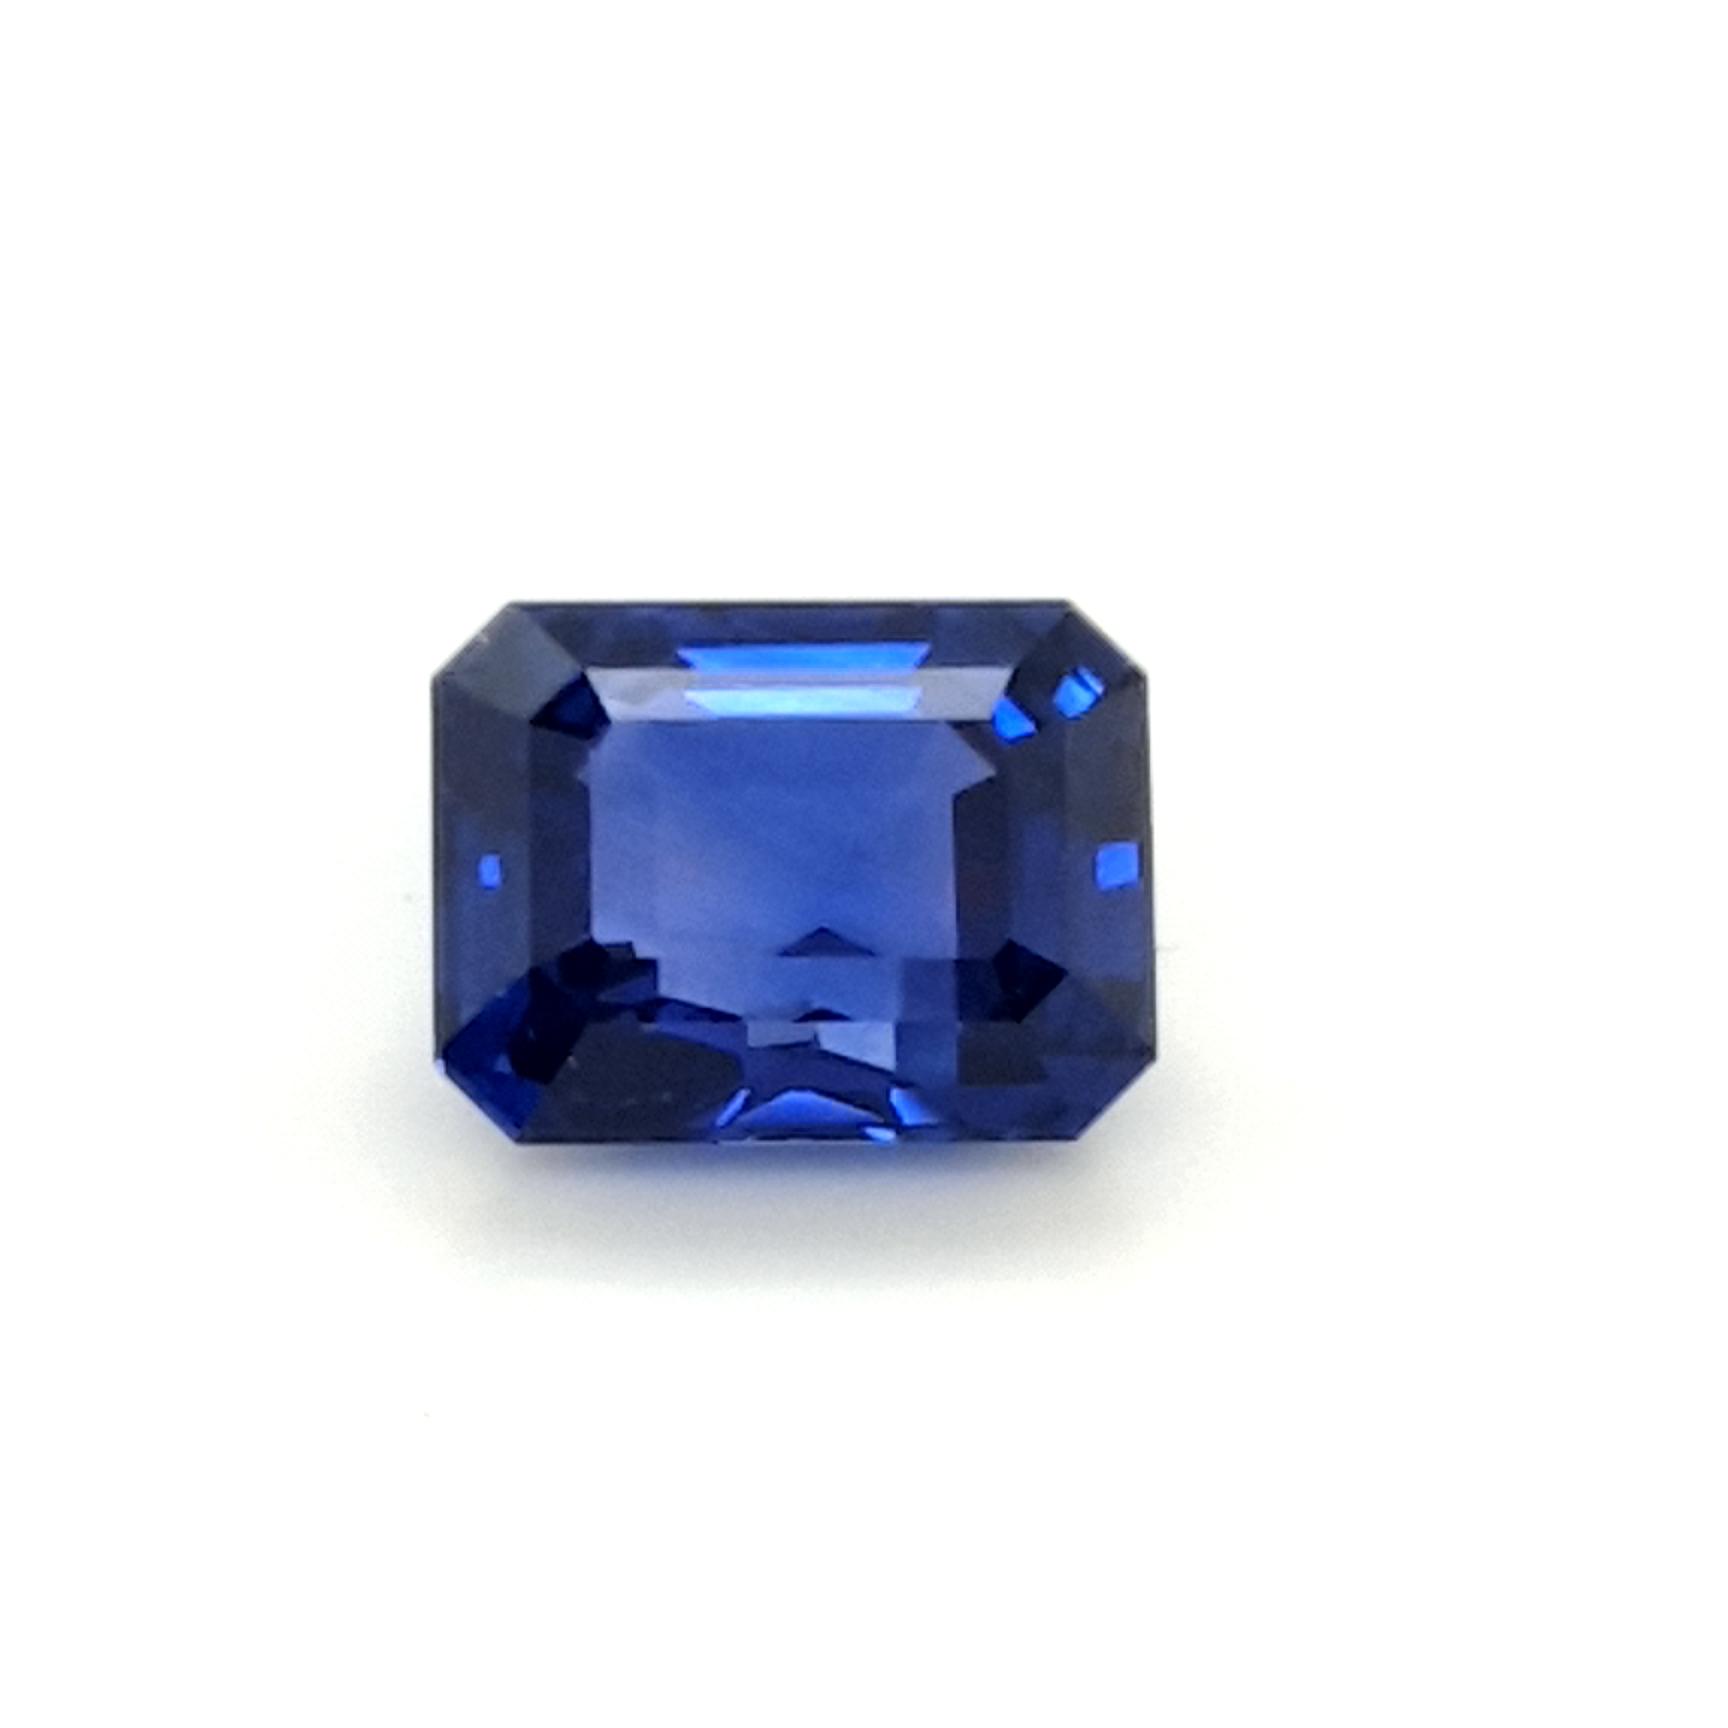 4,52ct. Sapphire Octagone RoyalBlue SAD15D8 ClaudiaHamann__2021-06-02-21-40-17